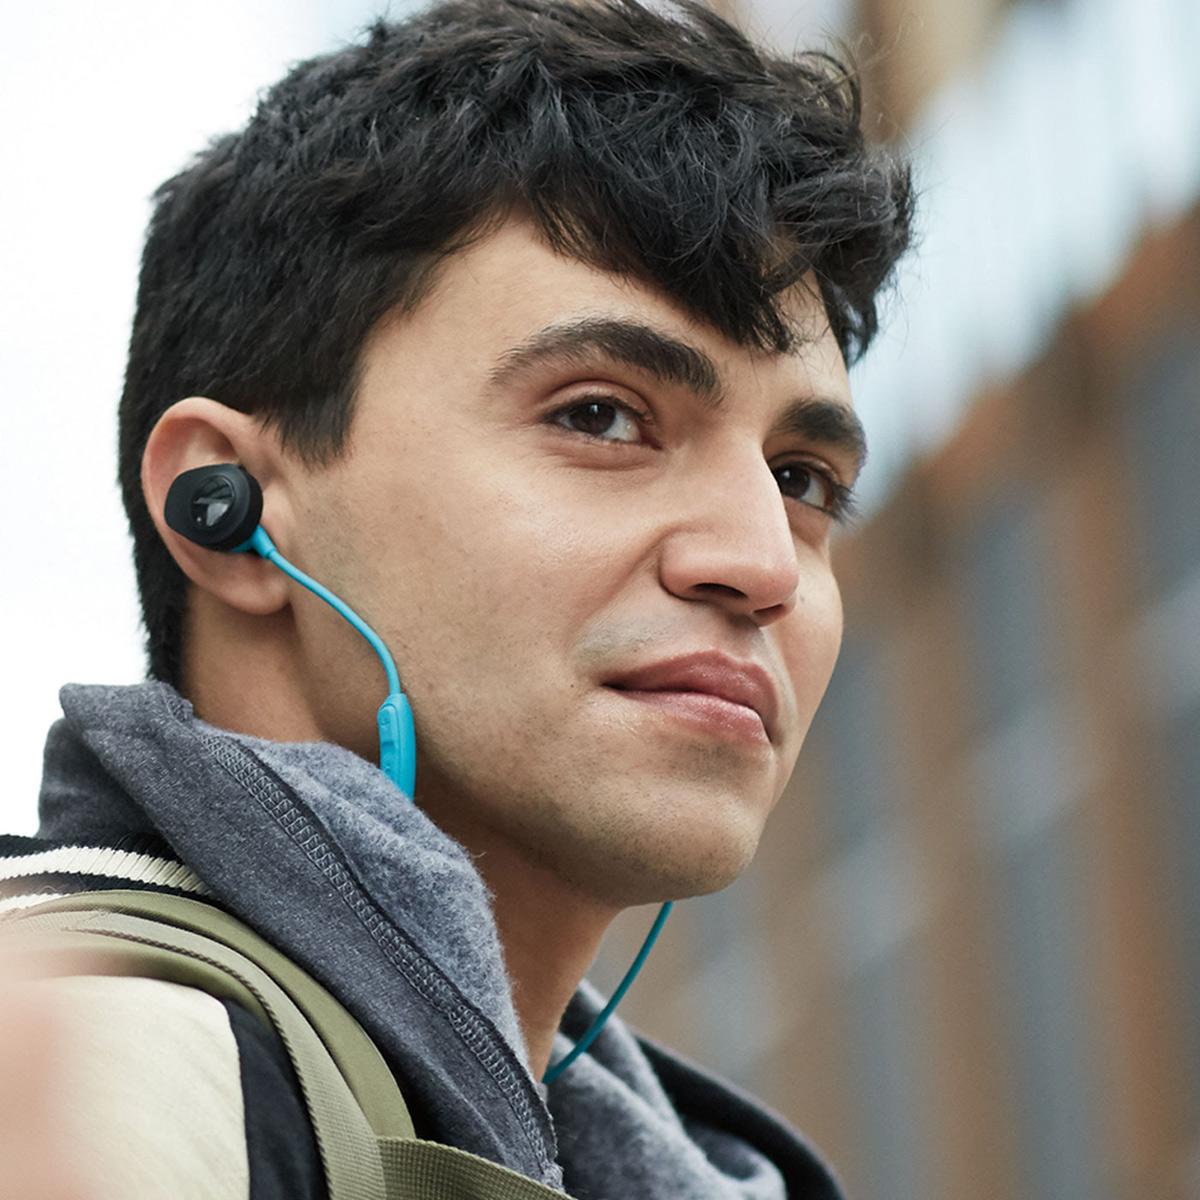 Bose soundsport wireless headphones - headphones bose android